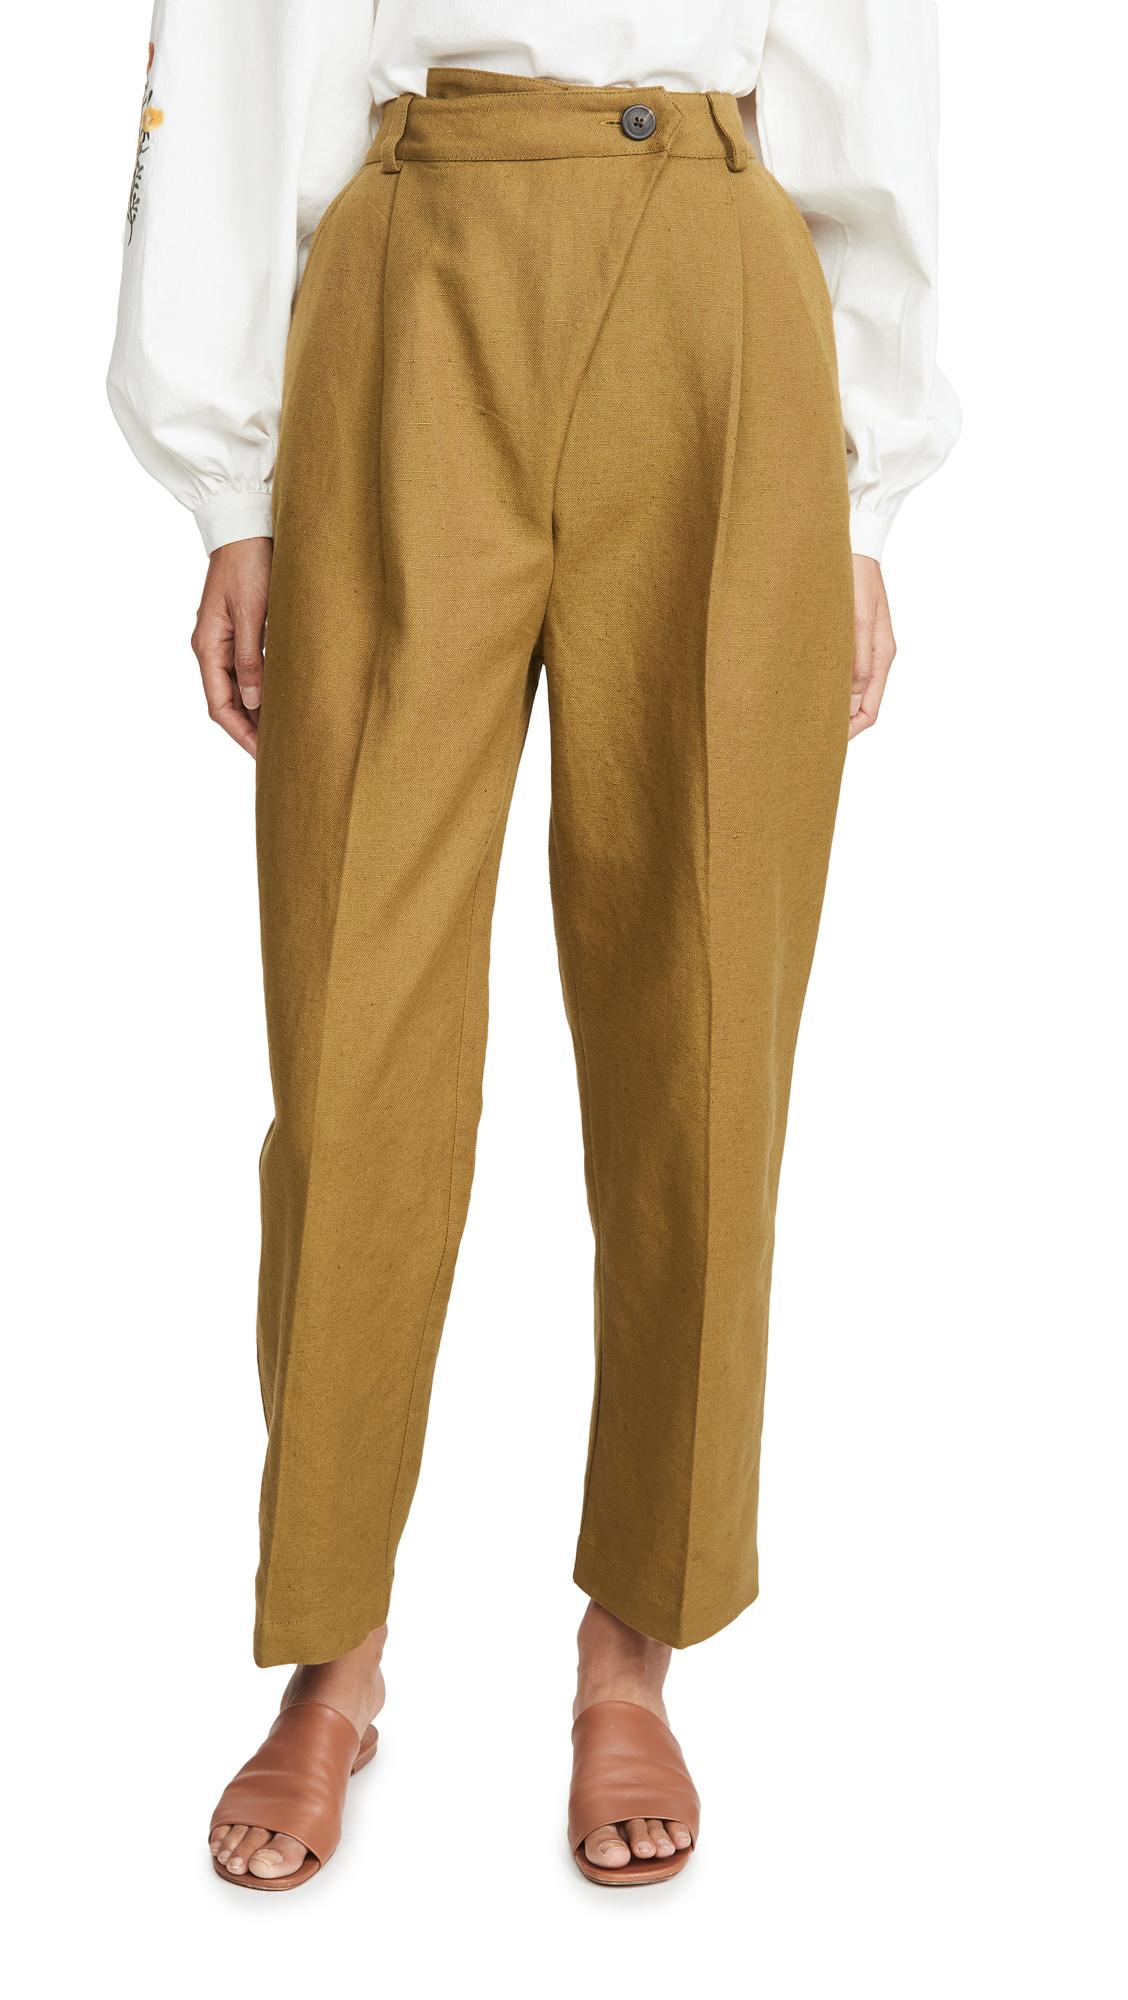 Mara Hoffman Almeria Trousers